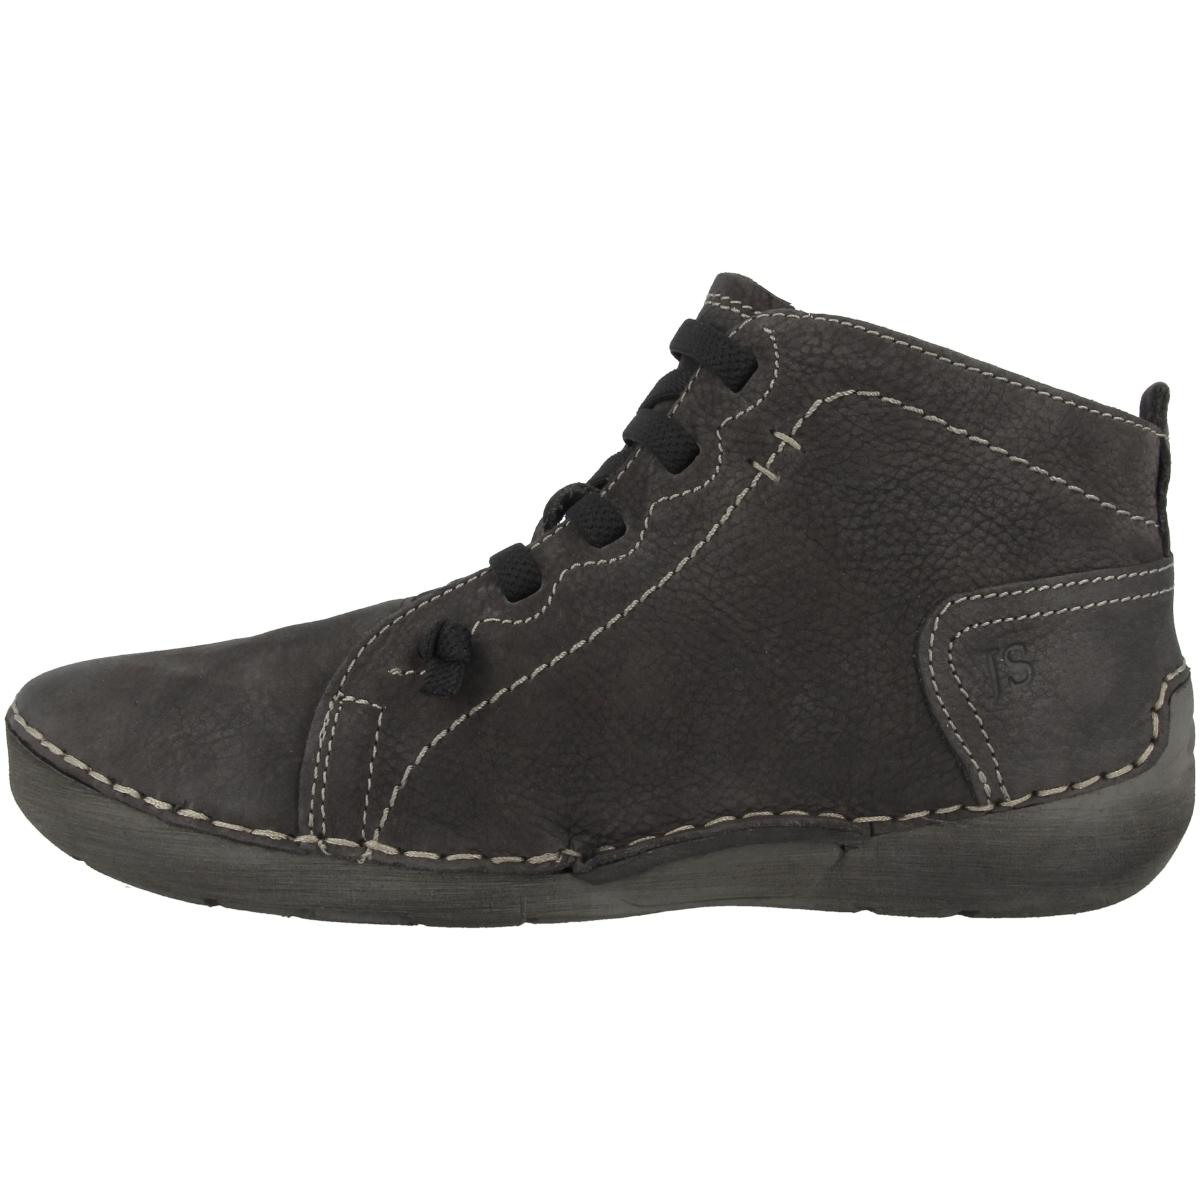 Josef Seibel Fergey 86 Schuhe Women Mid Cut Schnürschuhe Halbschuhe 59686-MI869